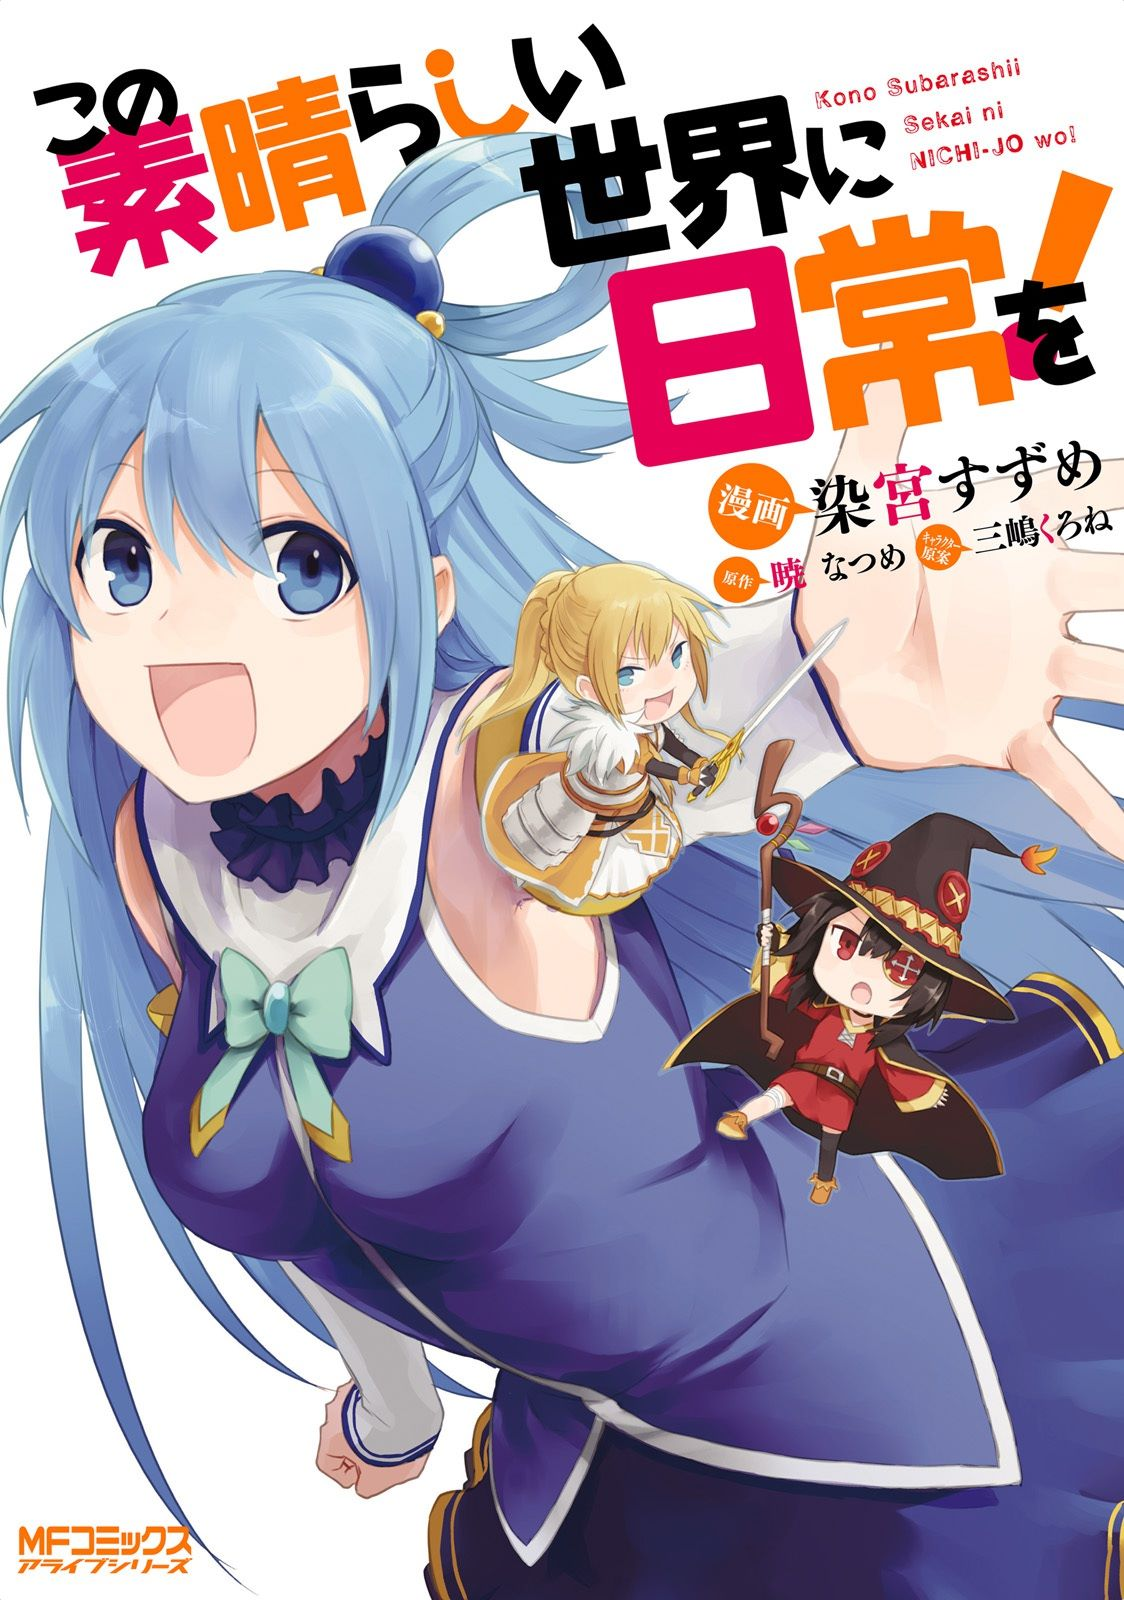 Konosuba Manga